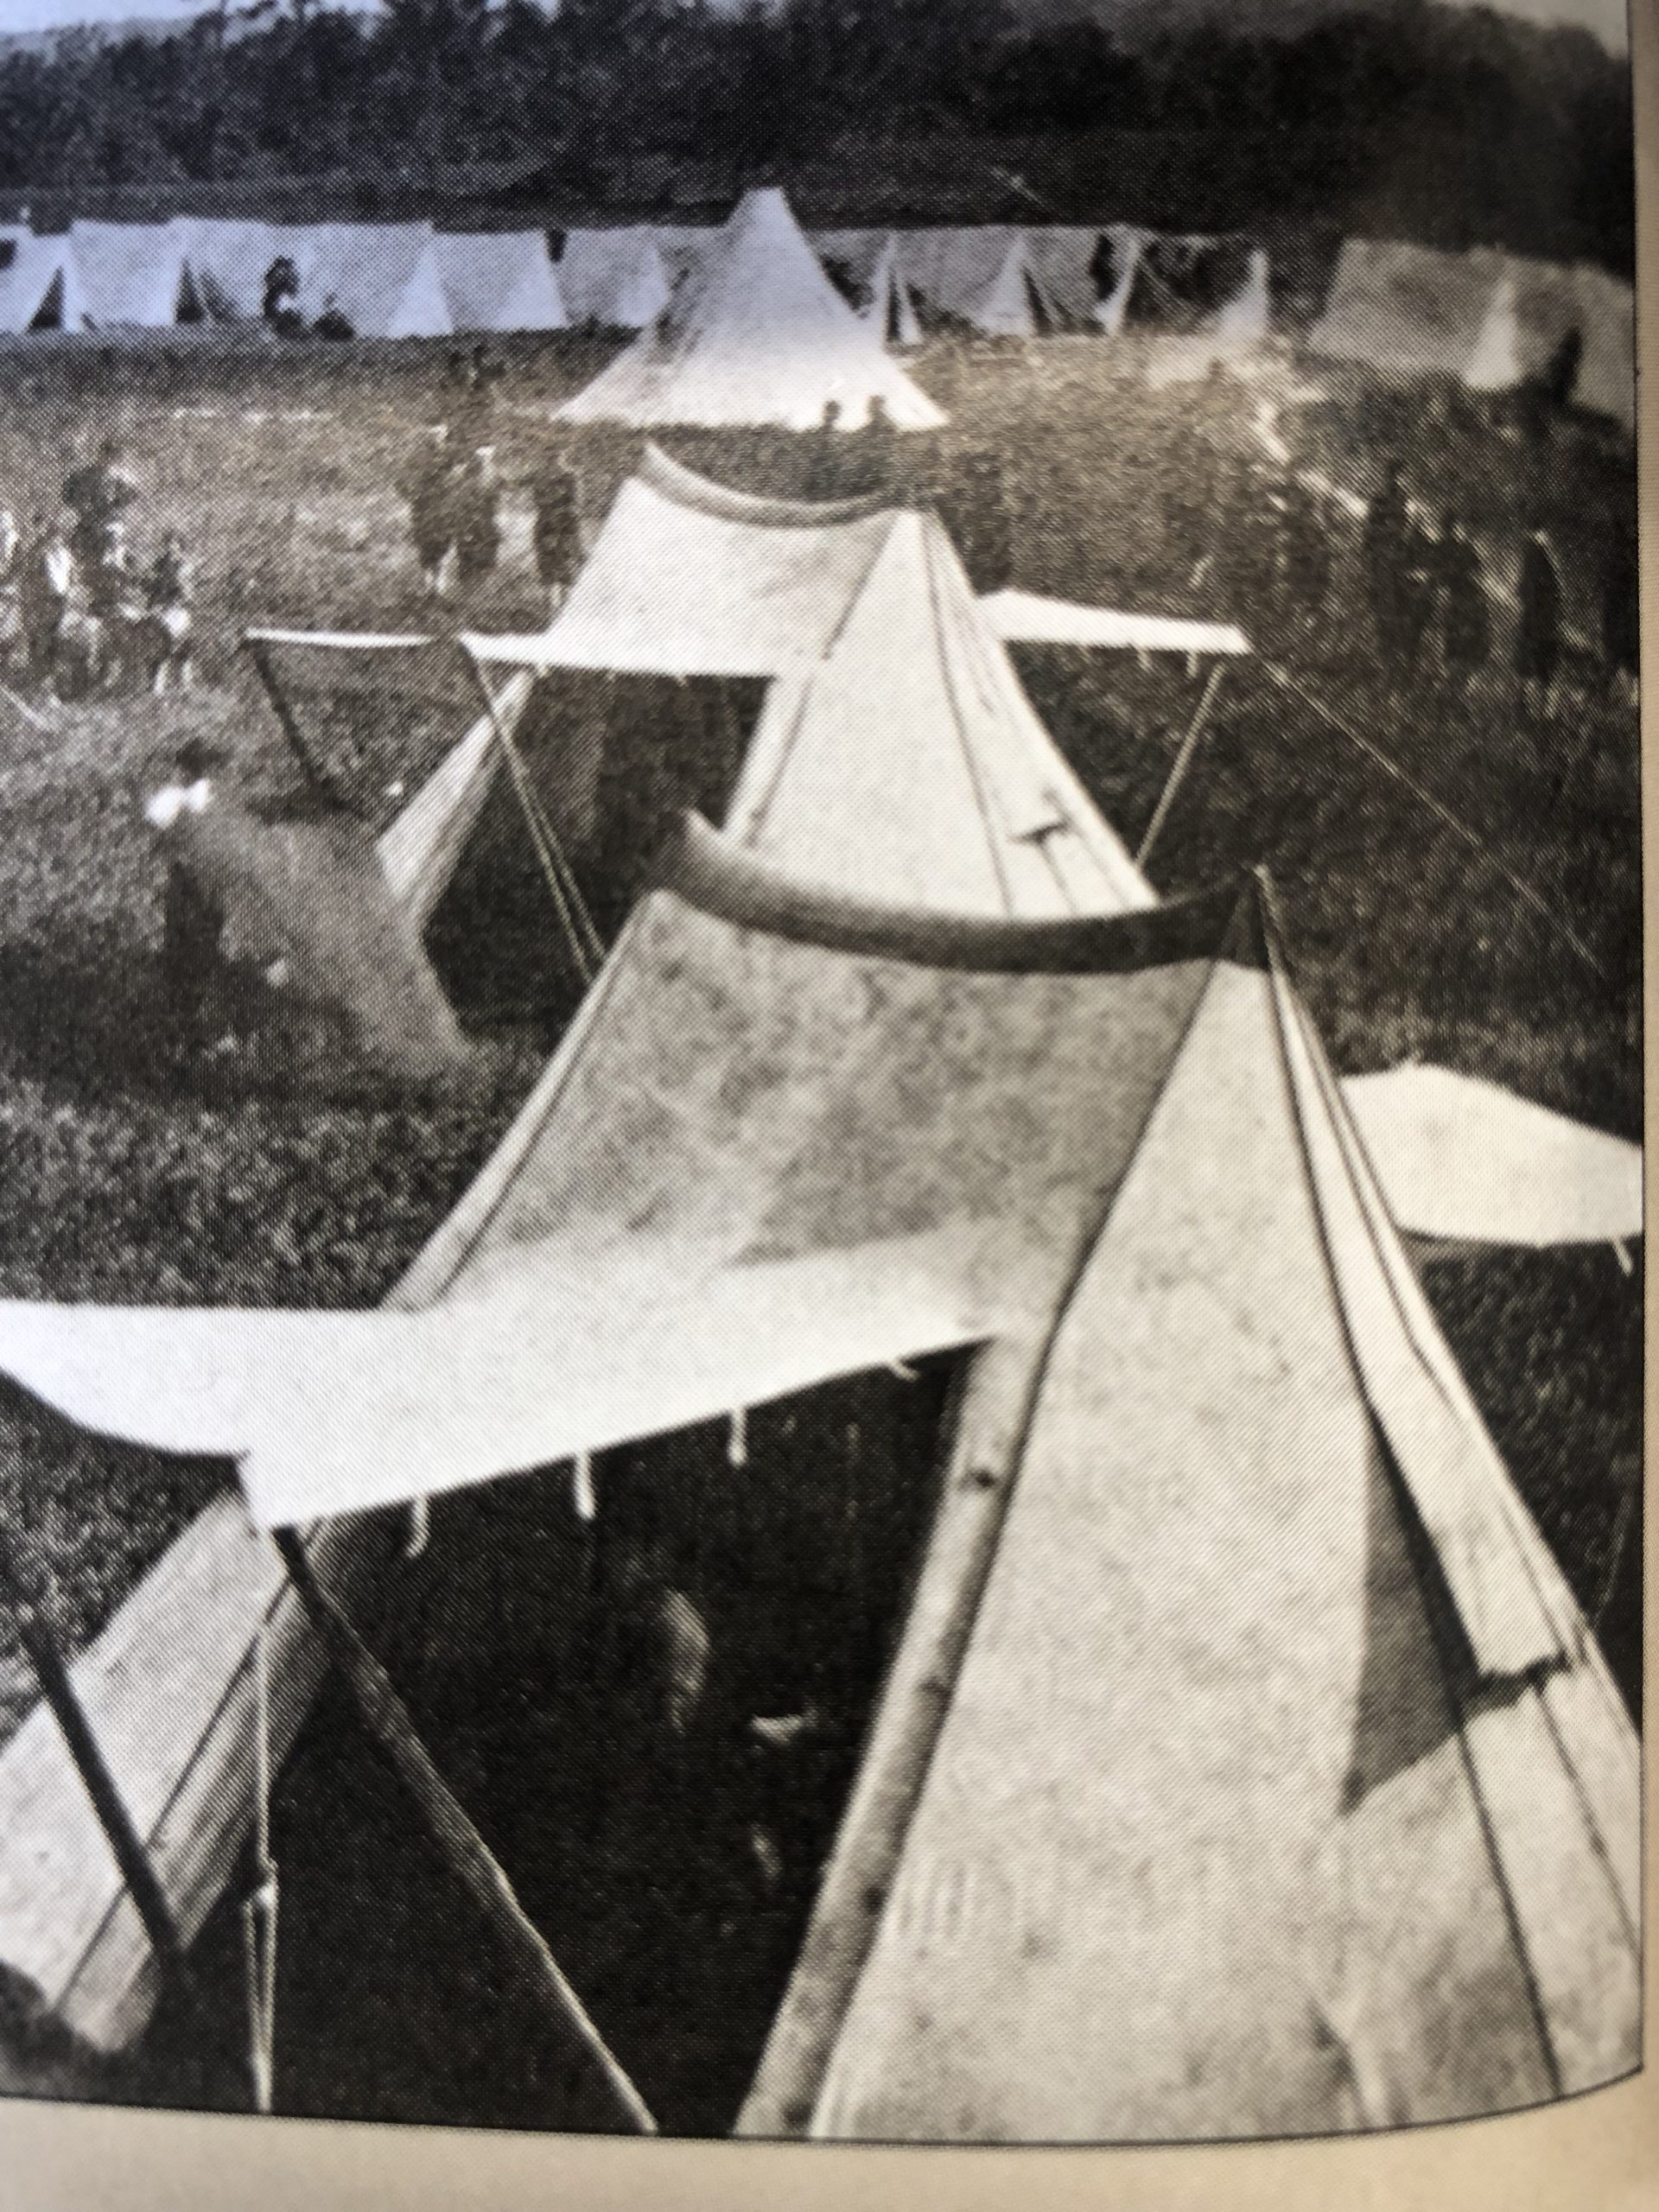 old photo of a Civil War encampment